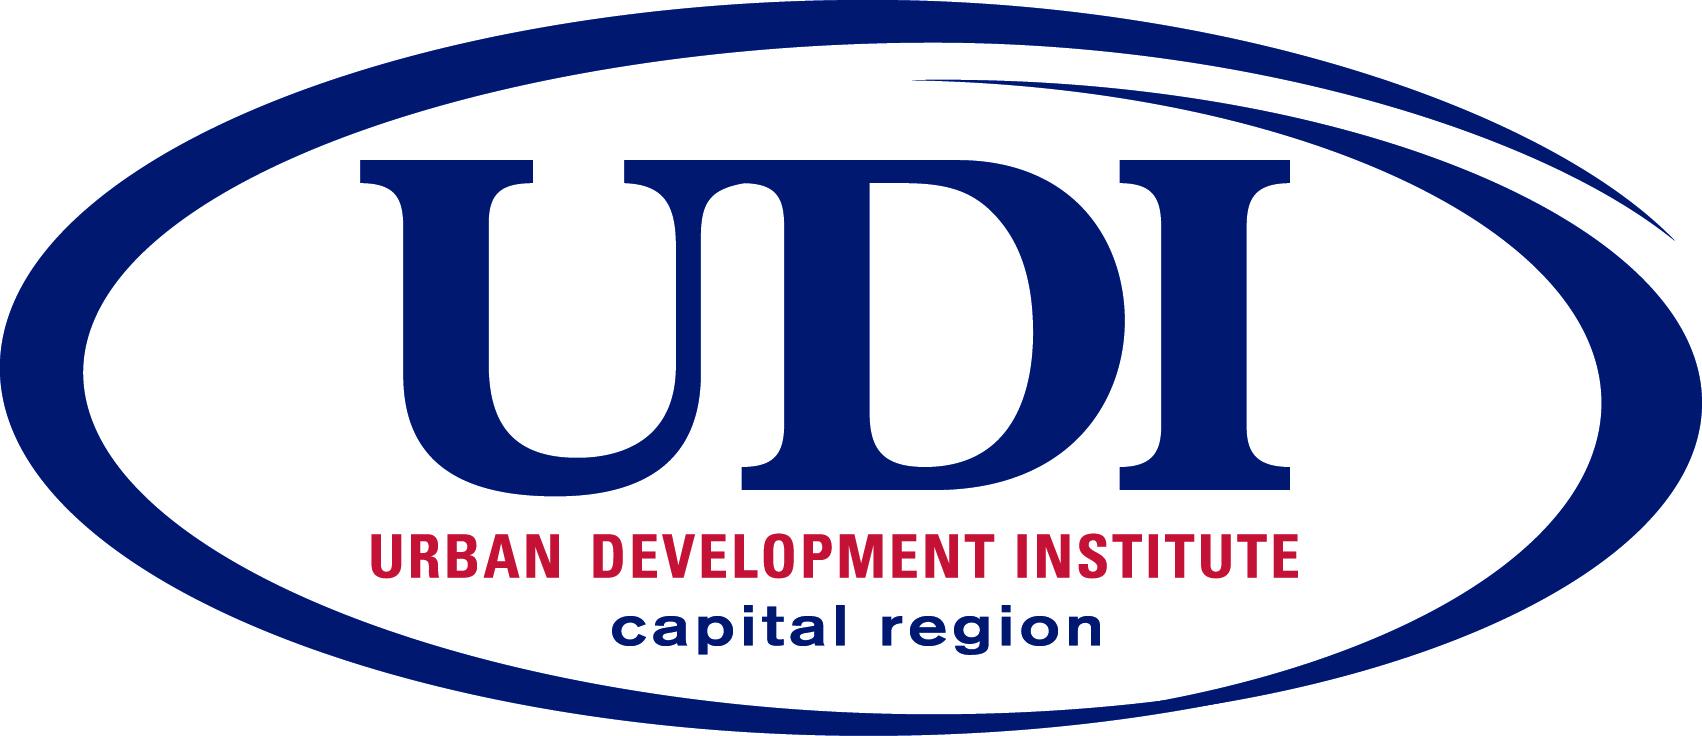 Urban Development Institute - Capital Region